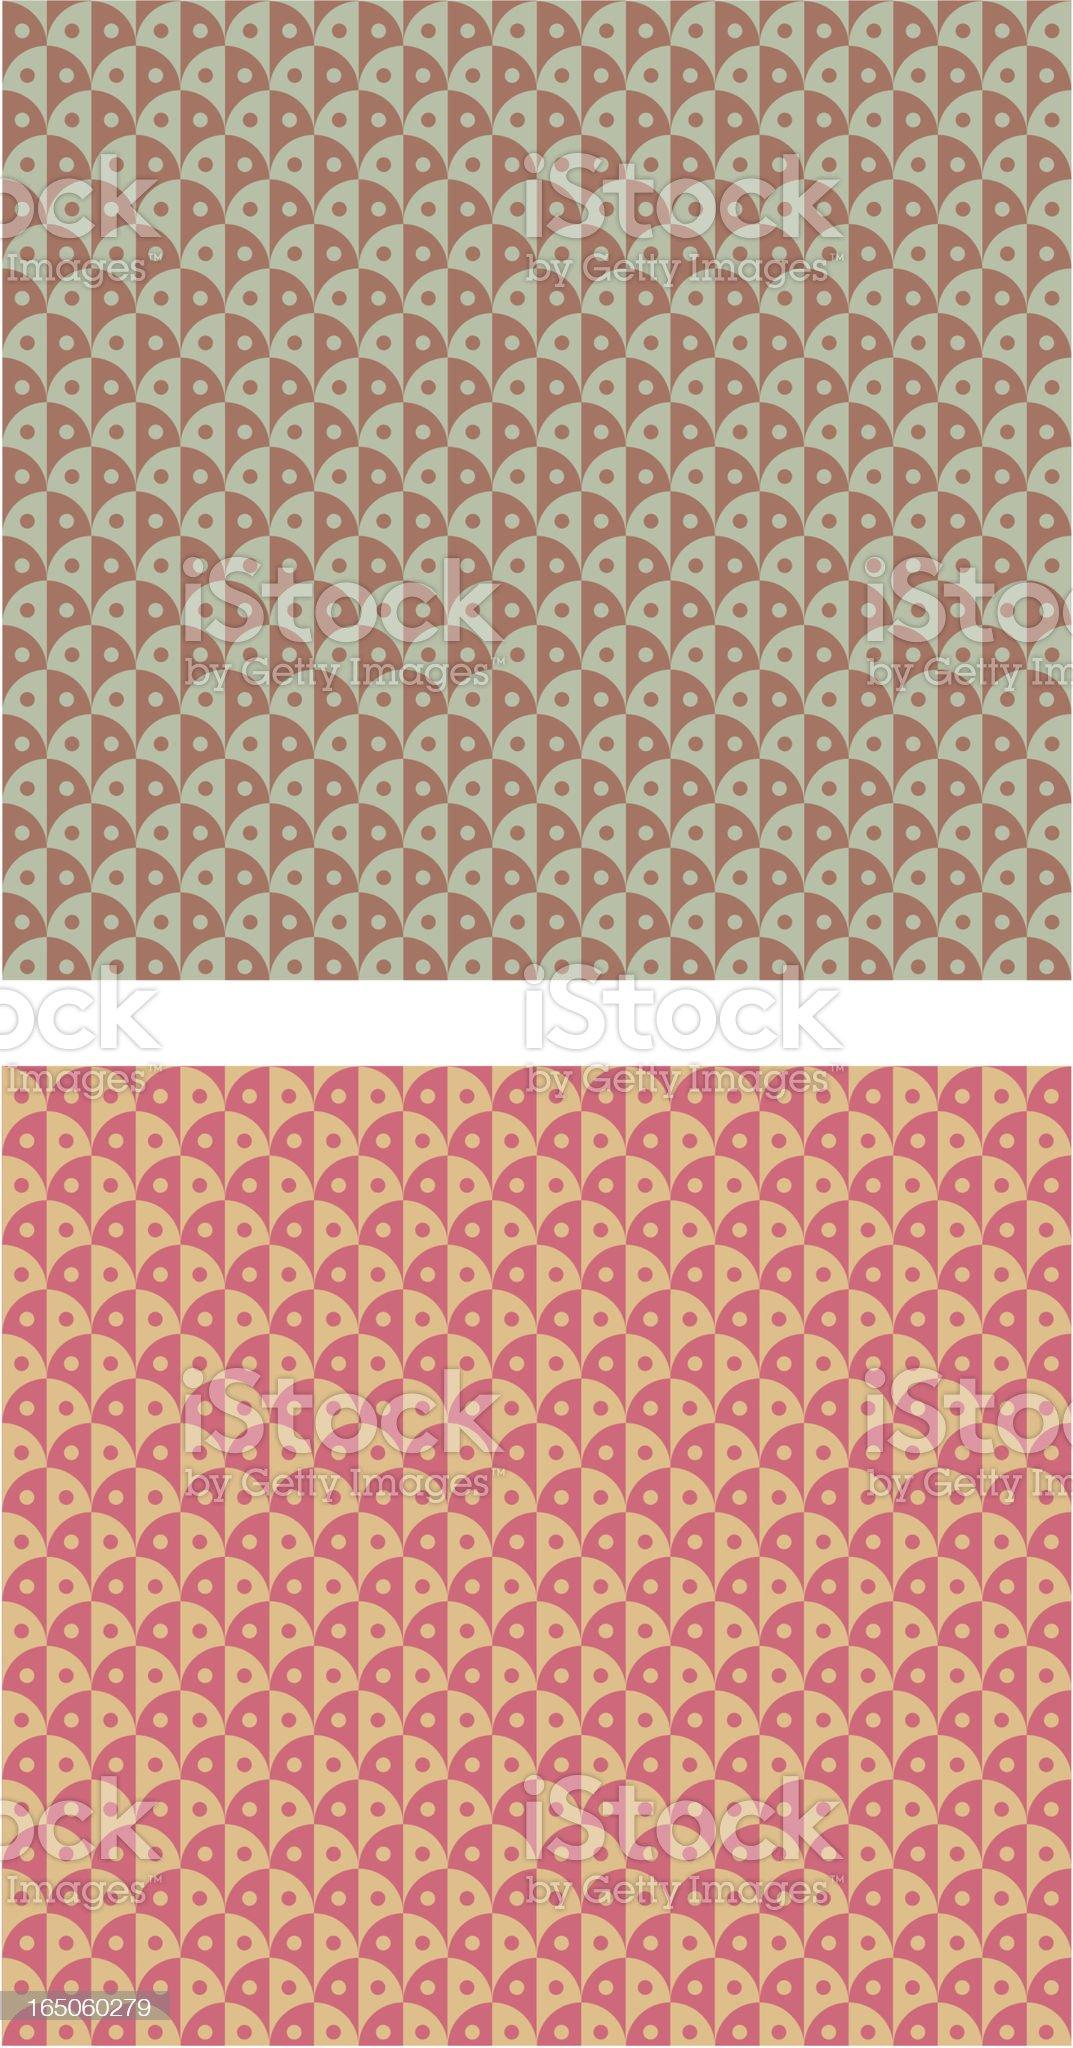 Retro pattern royalty-free stock vector art